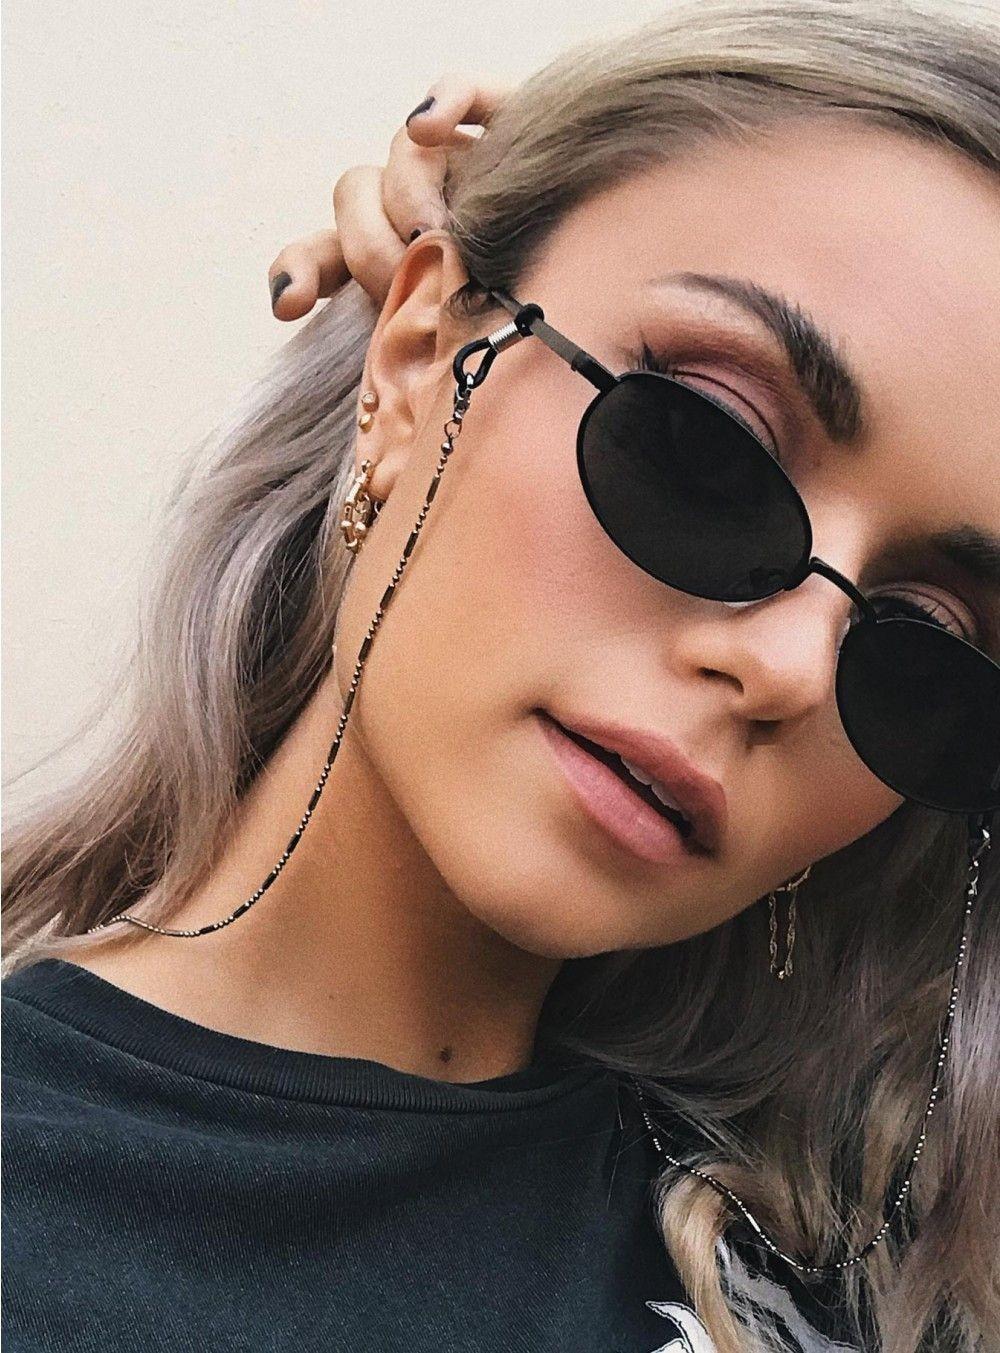 Lanyard For Glasses Bead Glasses Chain Fashion Glasses Strap Sunglasses Cords Casual Glasses Accessories DJ-162